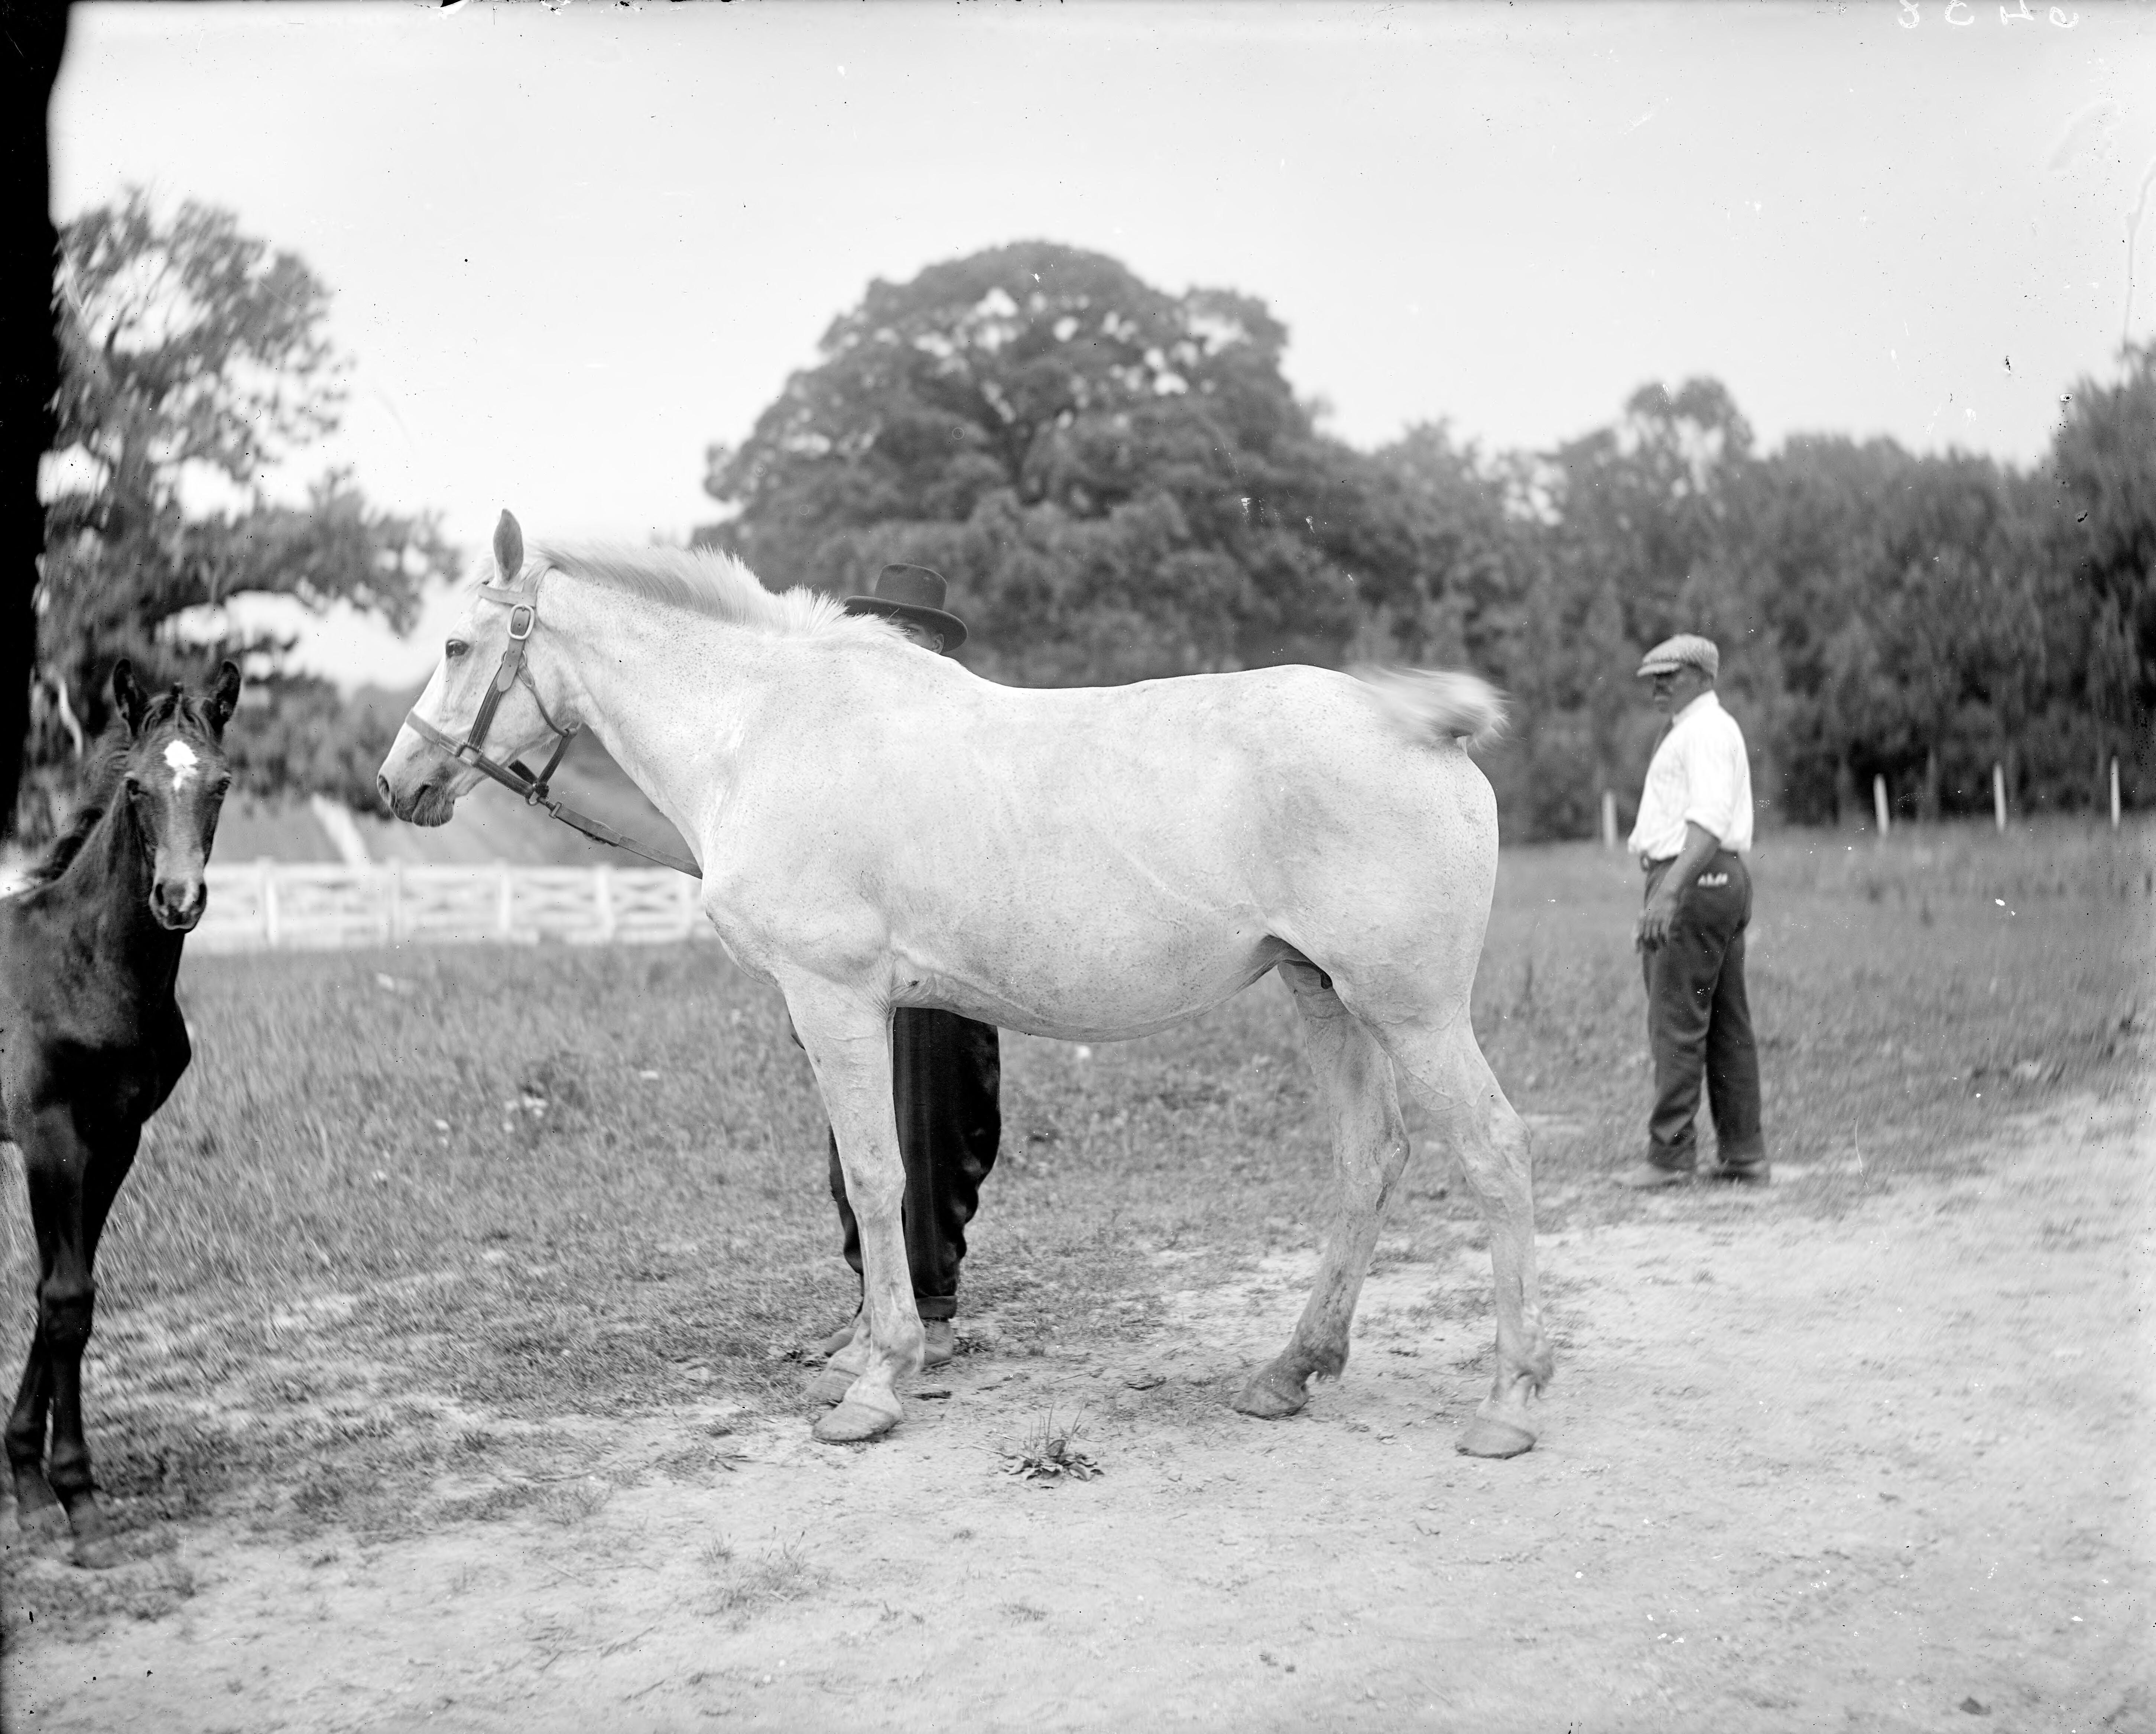 Mr. Randolf Ortman (Horses)